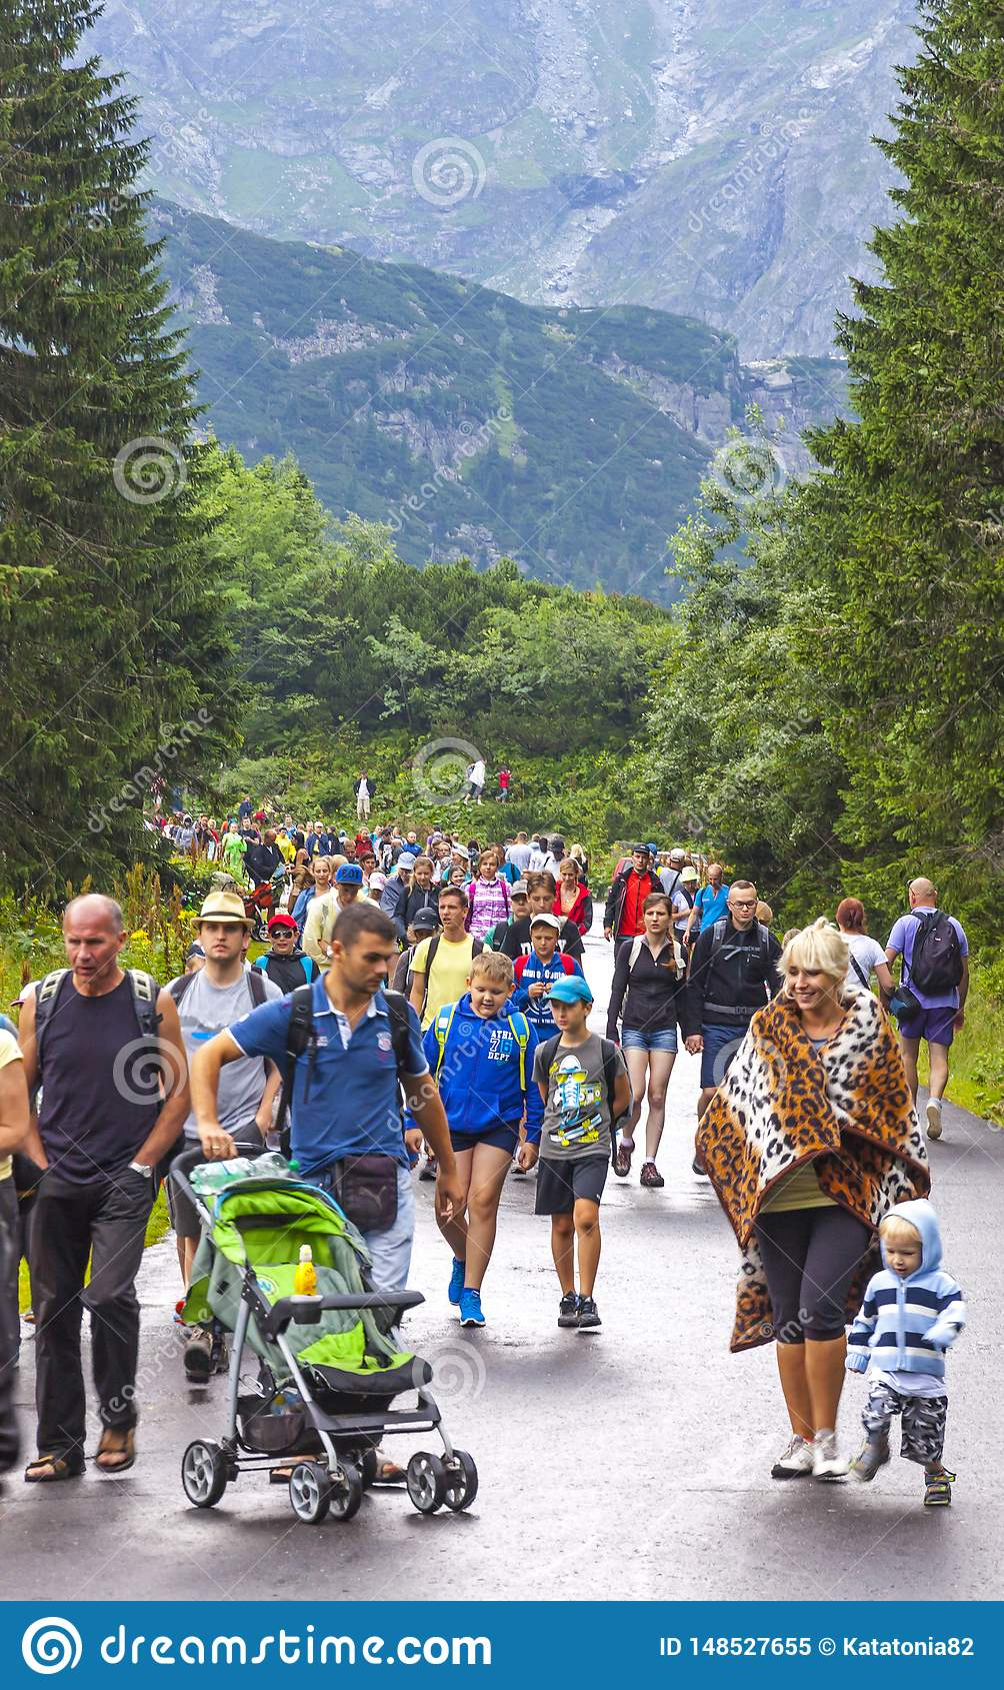 Tourists walking on road to Morskie Oko lake in High Tatras, Poland